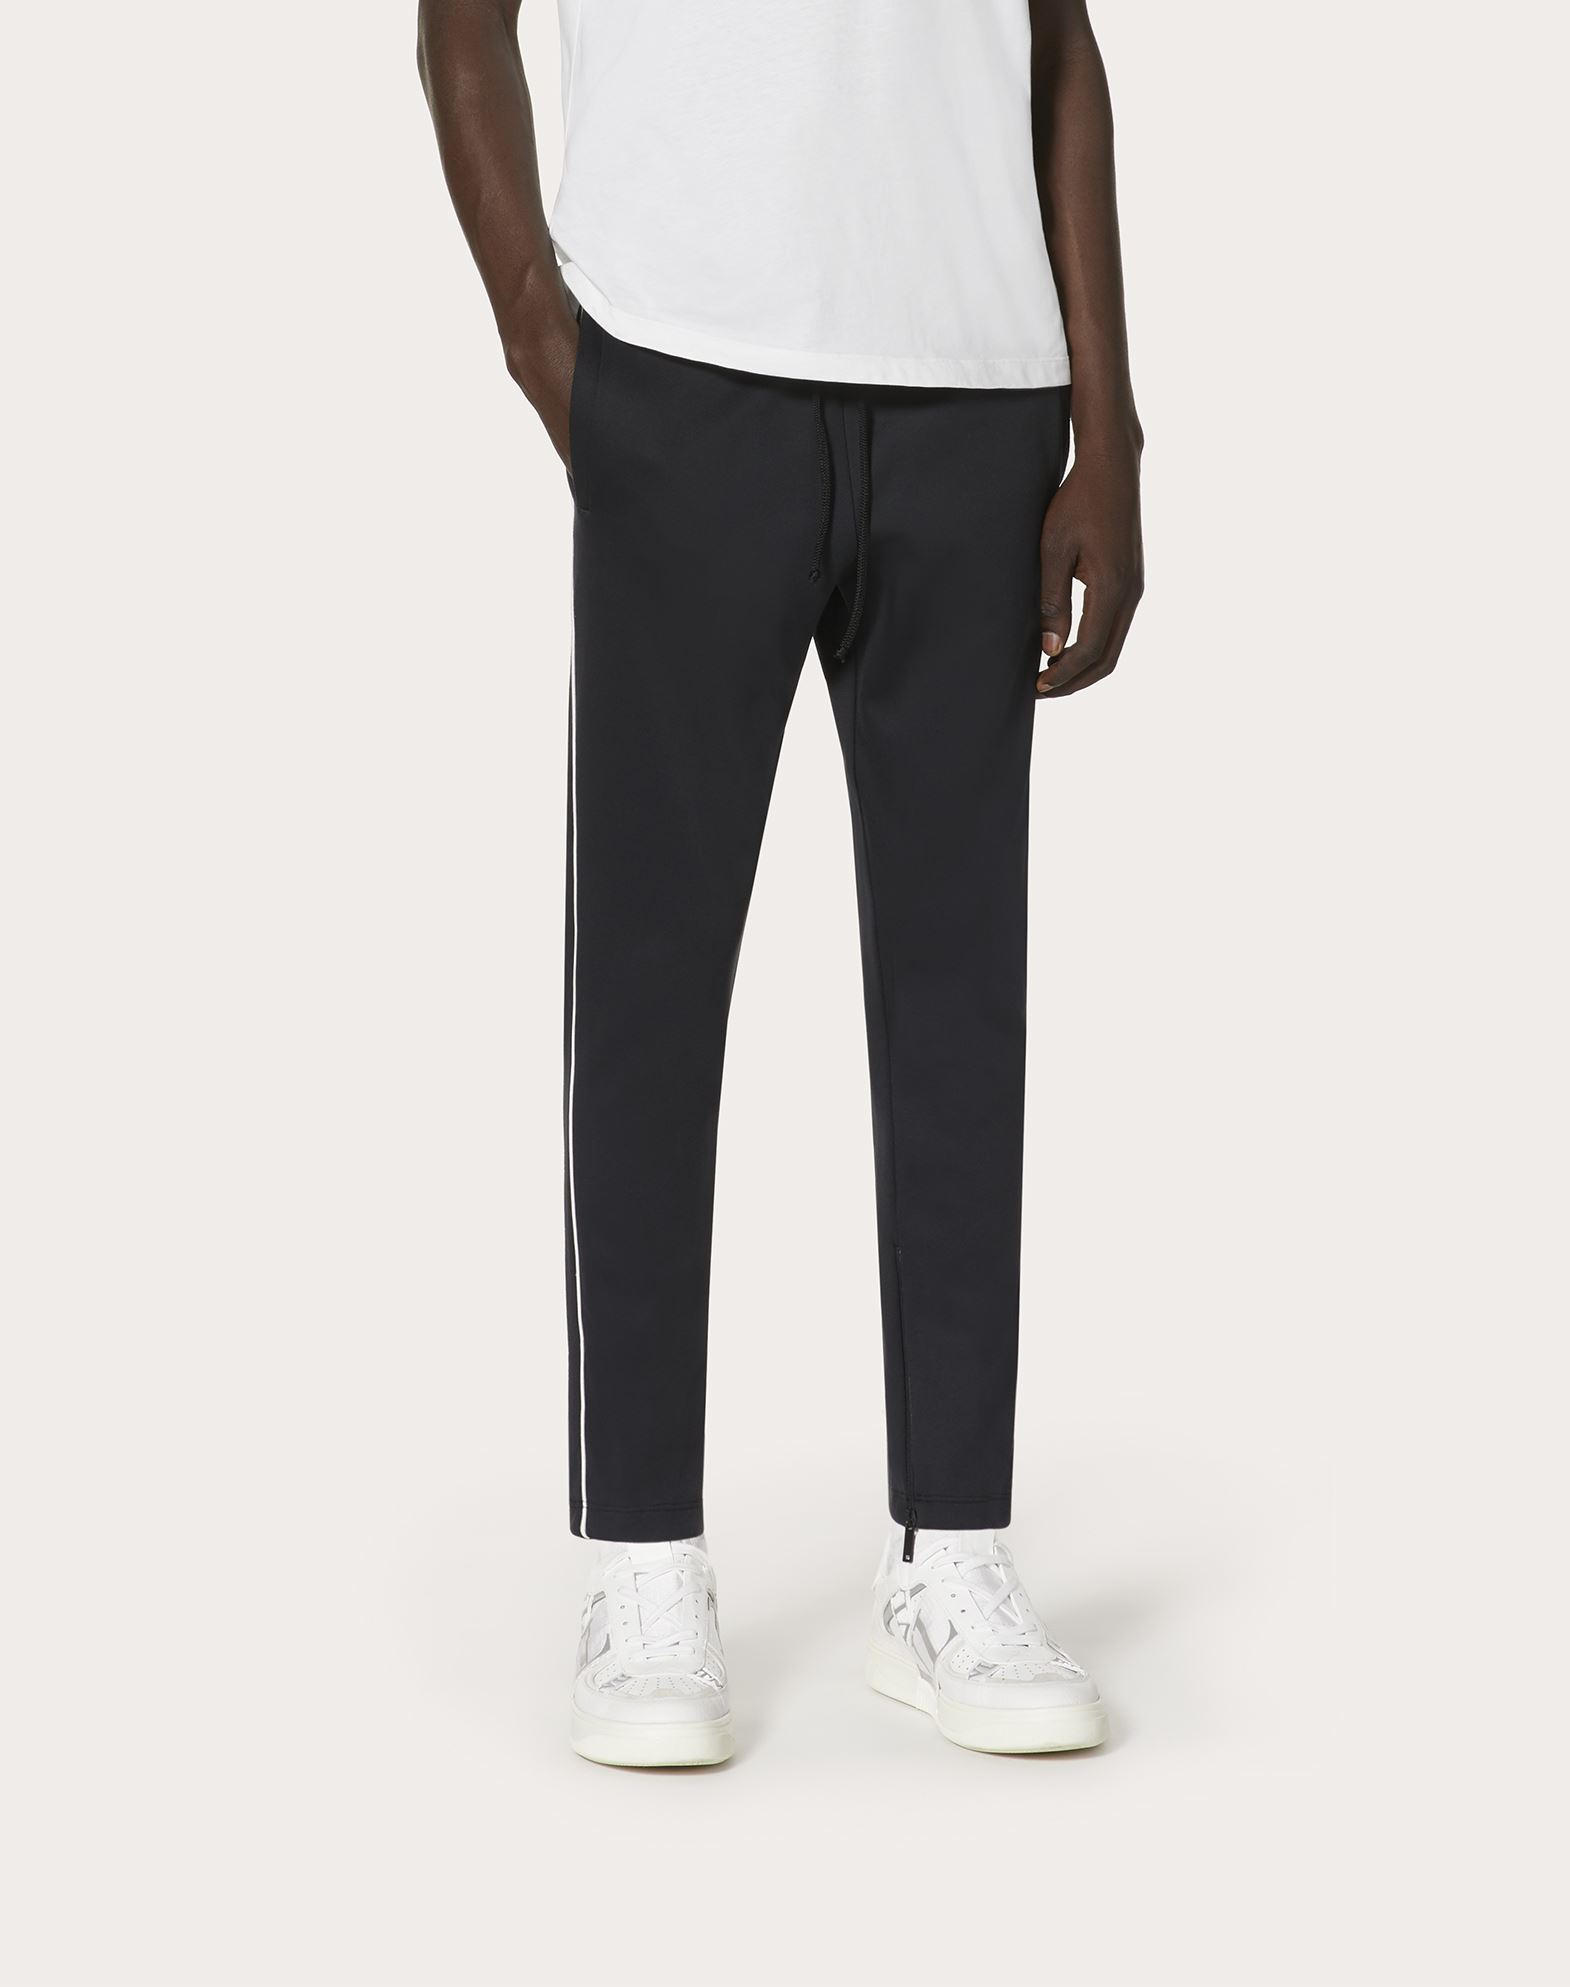 VALENTINO UOMO Pantalones jogger de punto   Pantalón U d